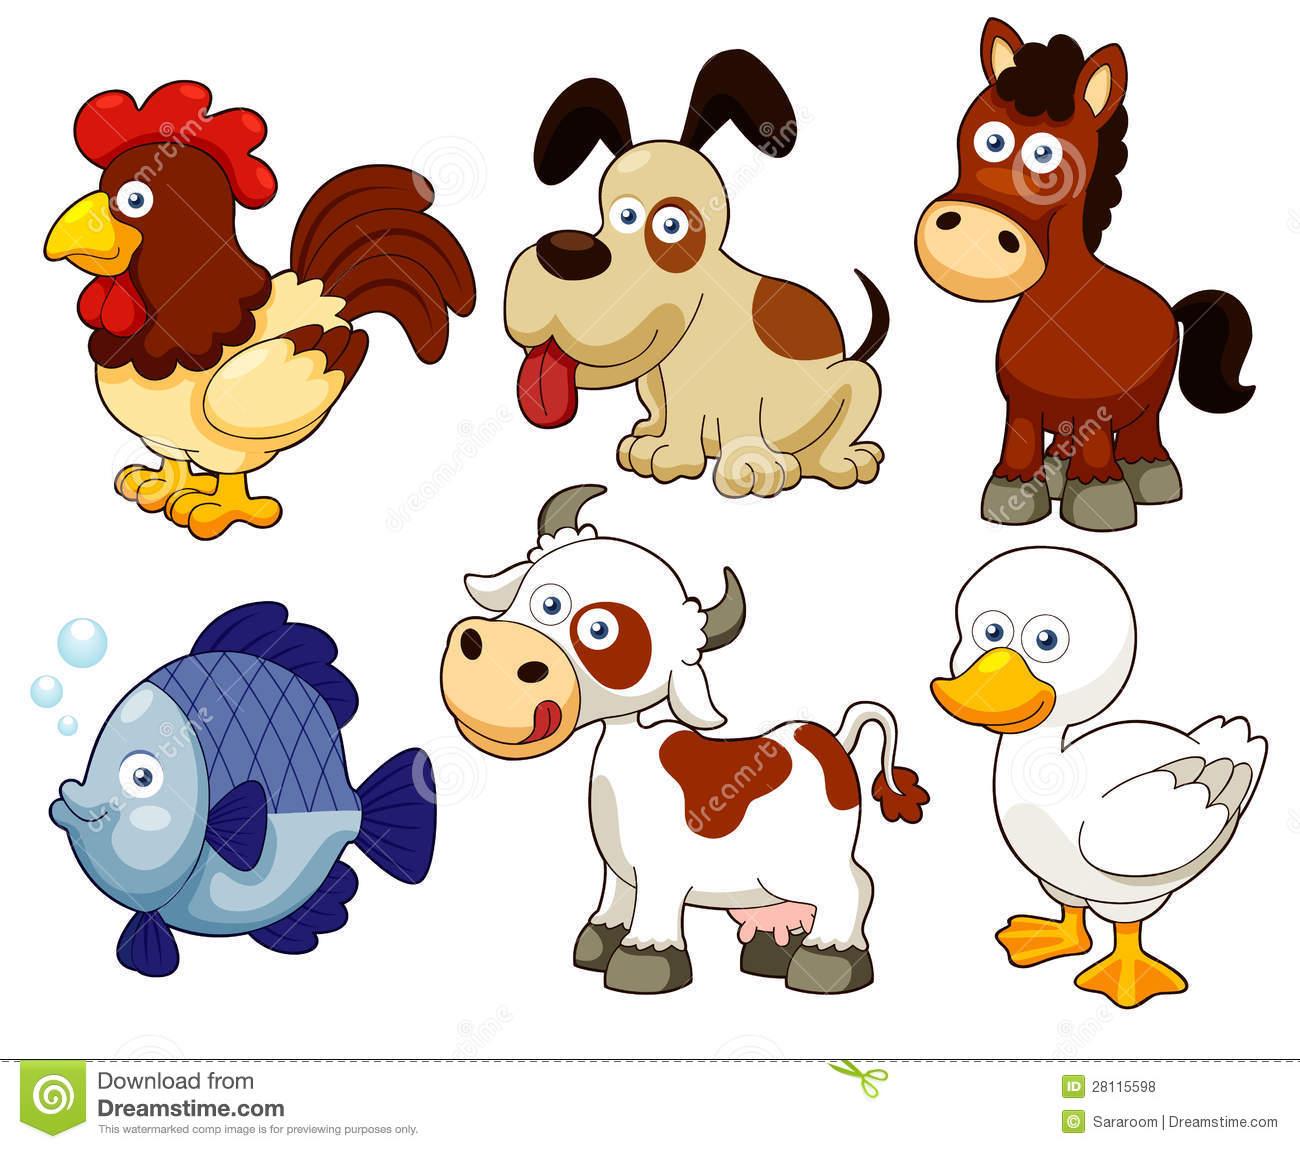 Download Farm Animals Free .-Download Farm Animals Free .-8